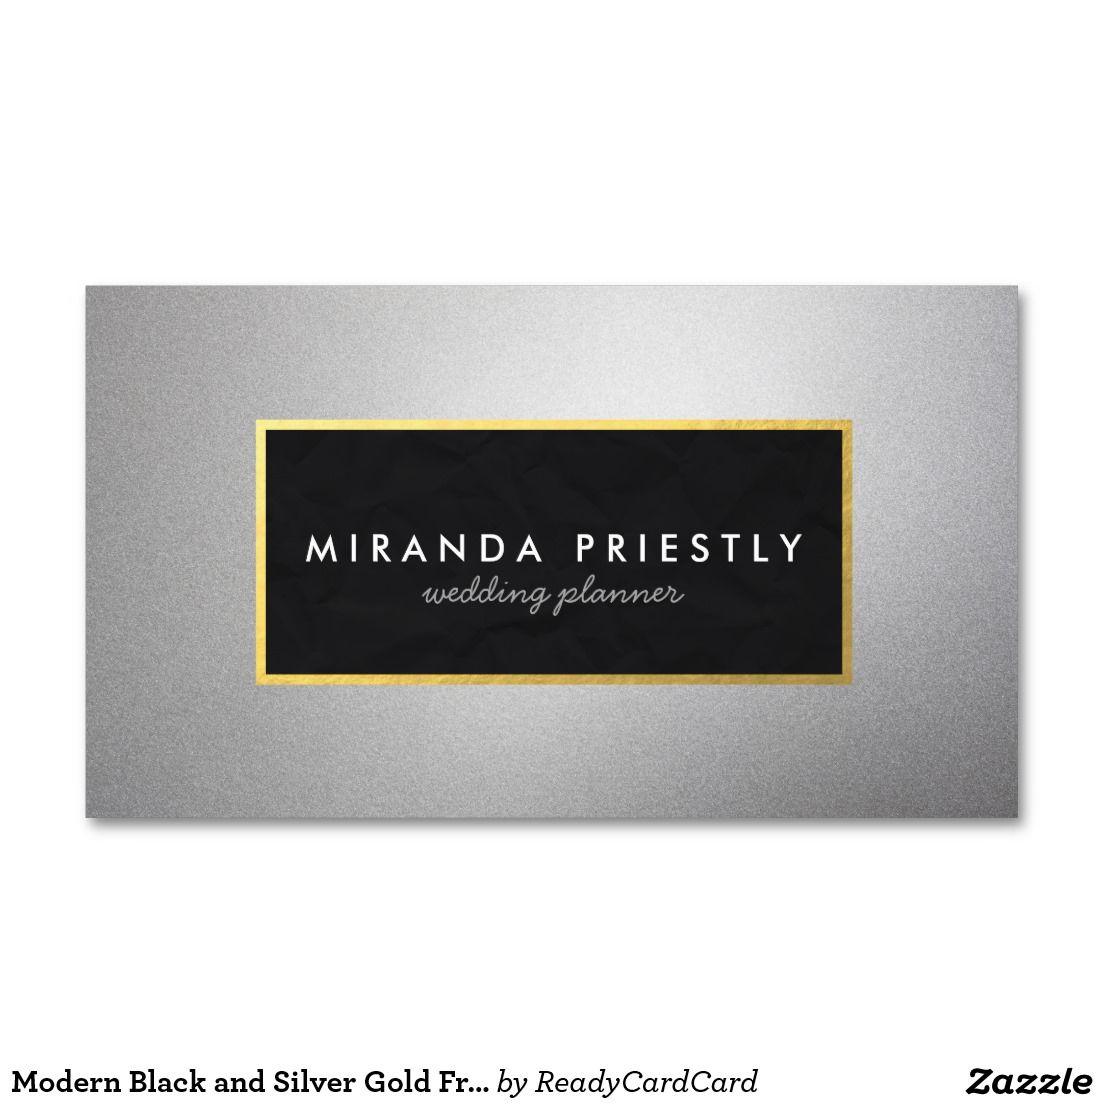 Modern Black and Silver Gold Frame Wedding Planner Business Card ...